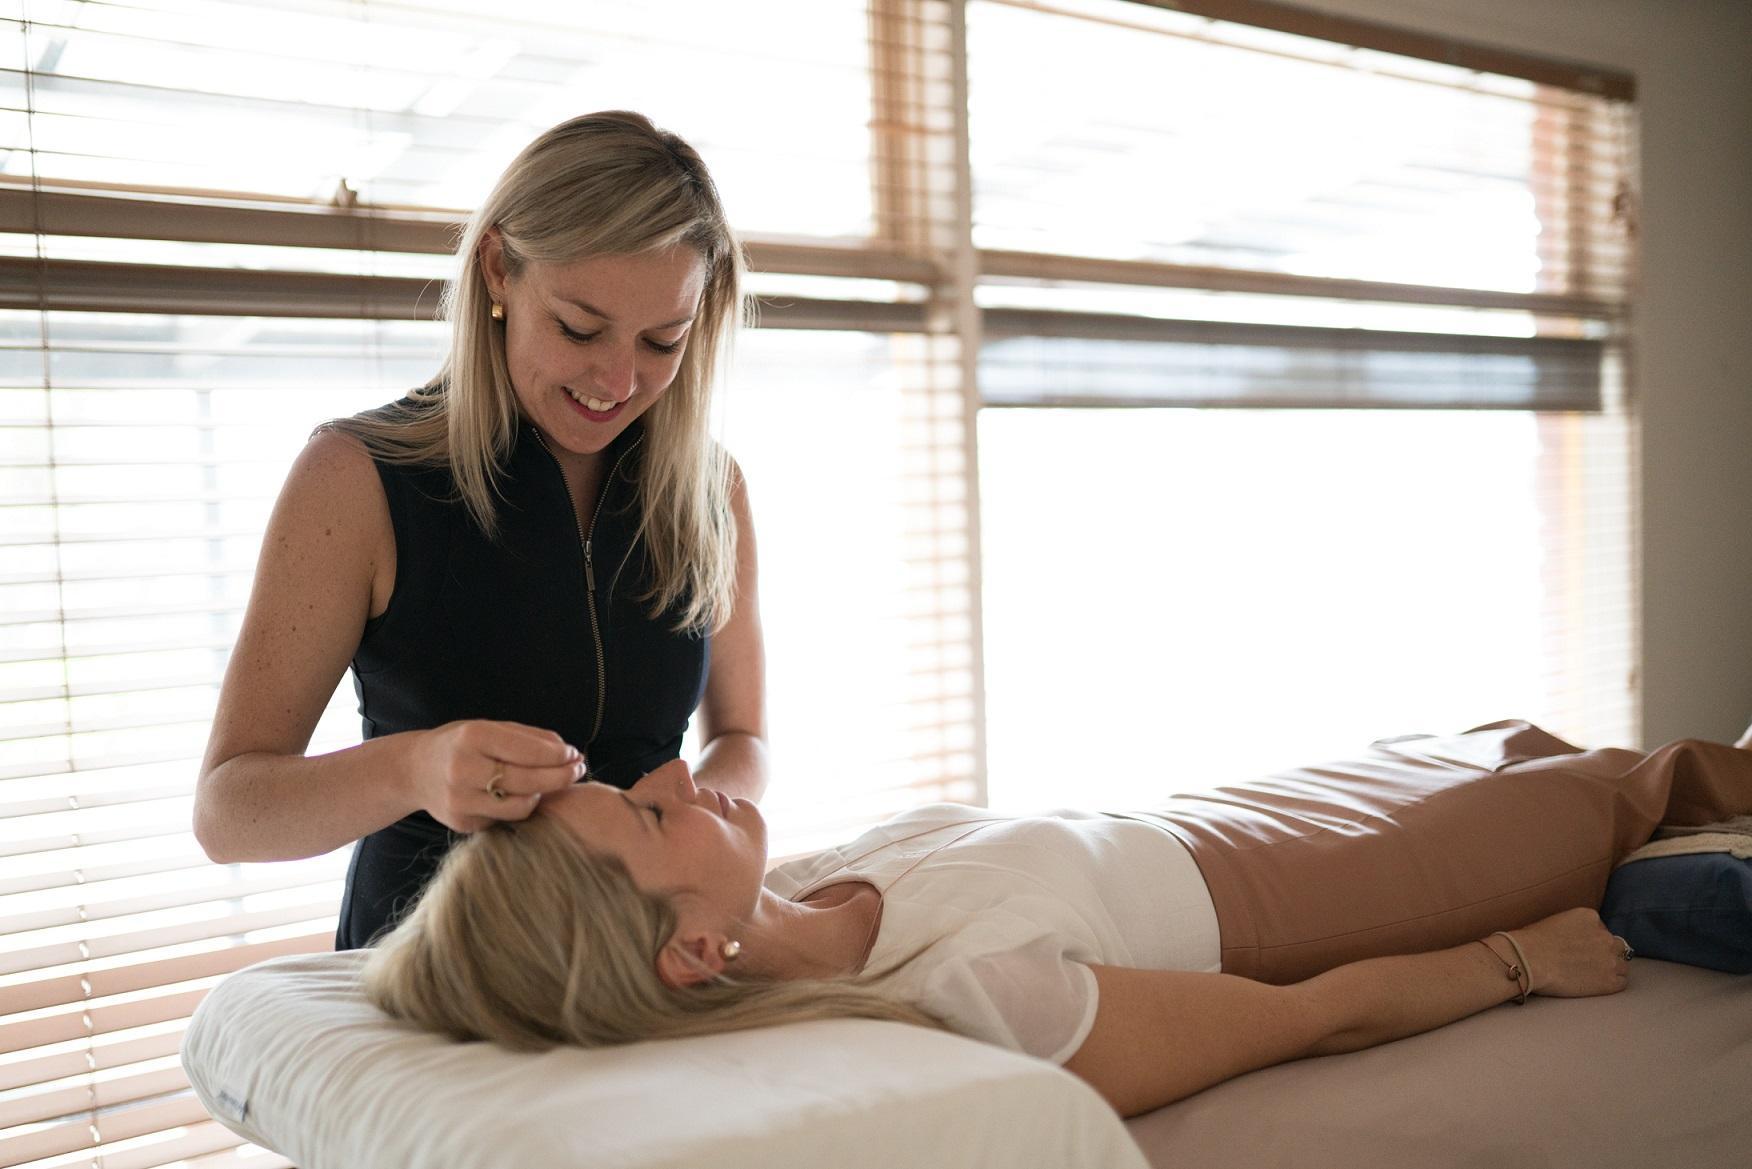 natural beauty expert - zhong centre - interview with Dr abbie